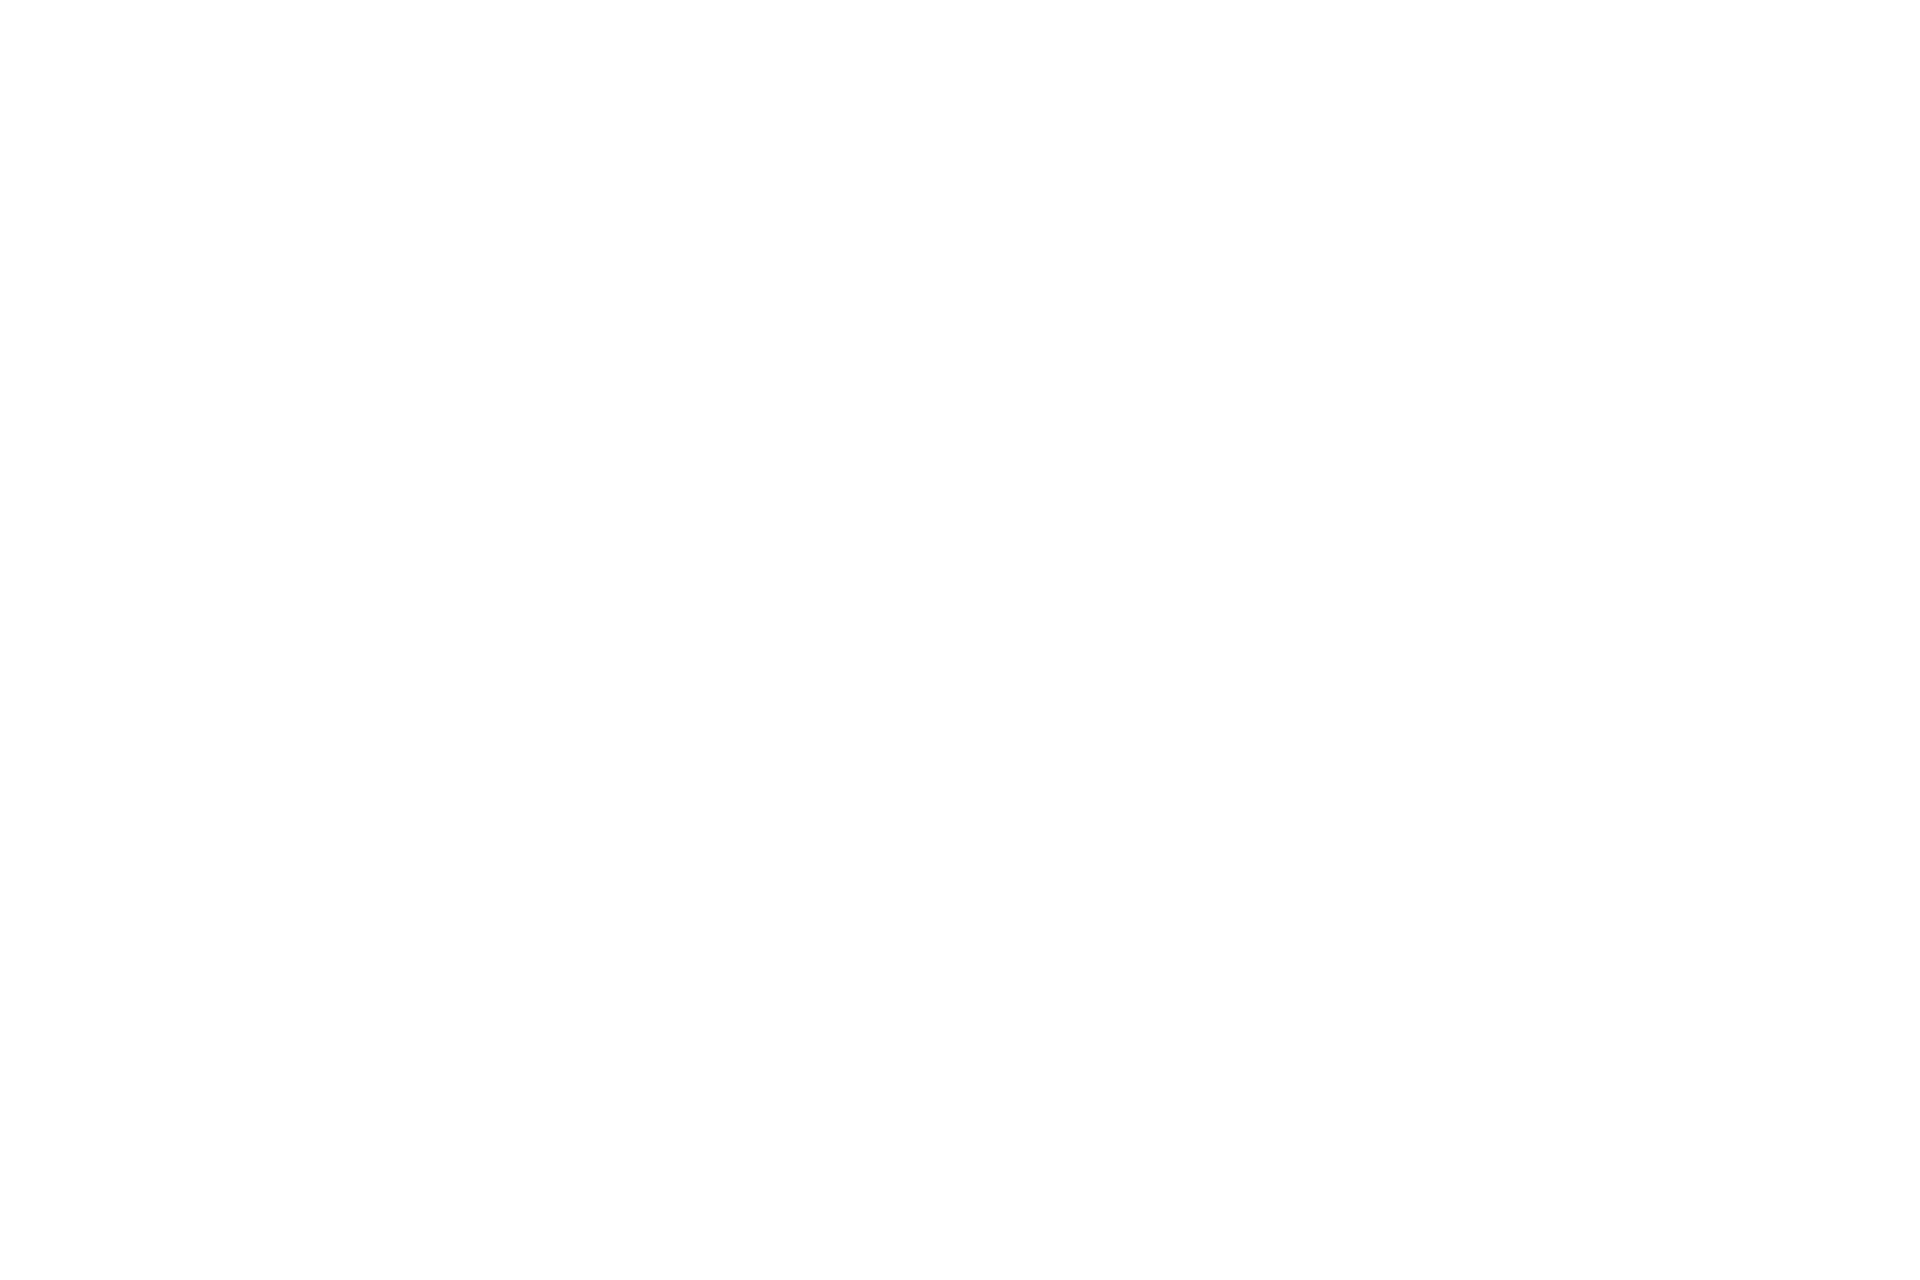 Youtube Platzhalter - Winnetou I | offizieller Trailer | Landesbühnen Sachsen